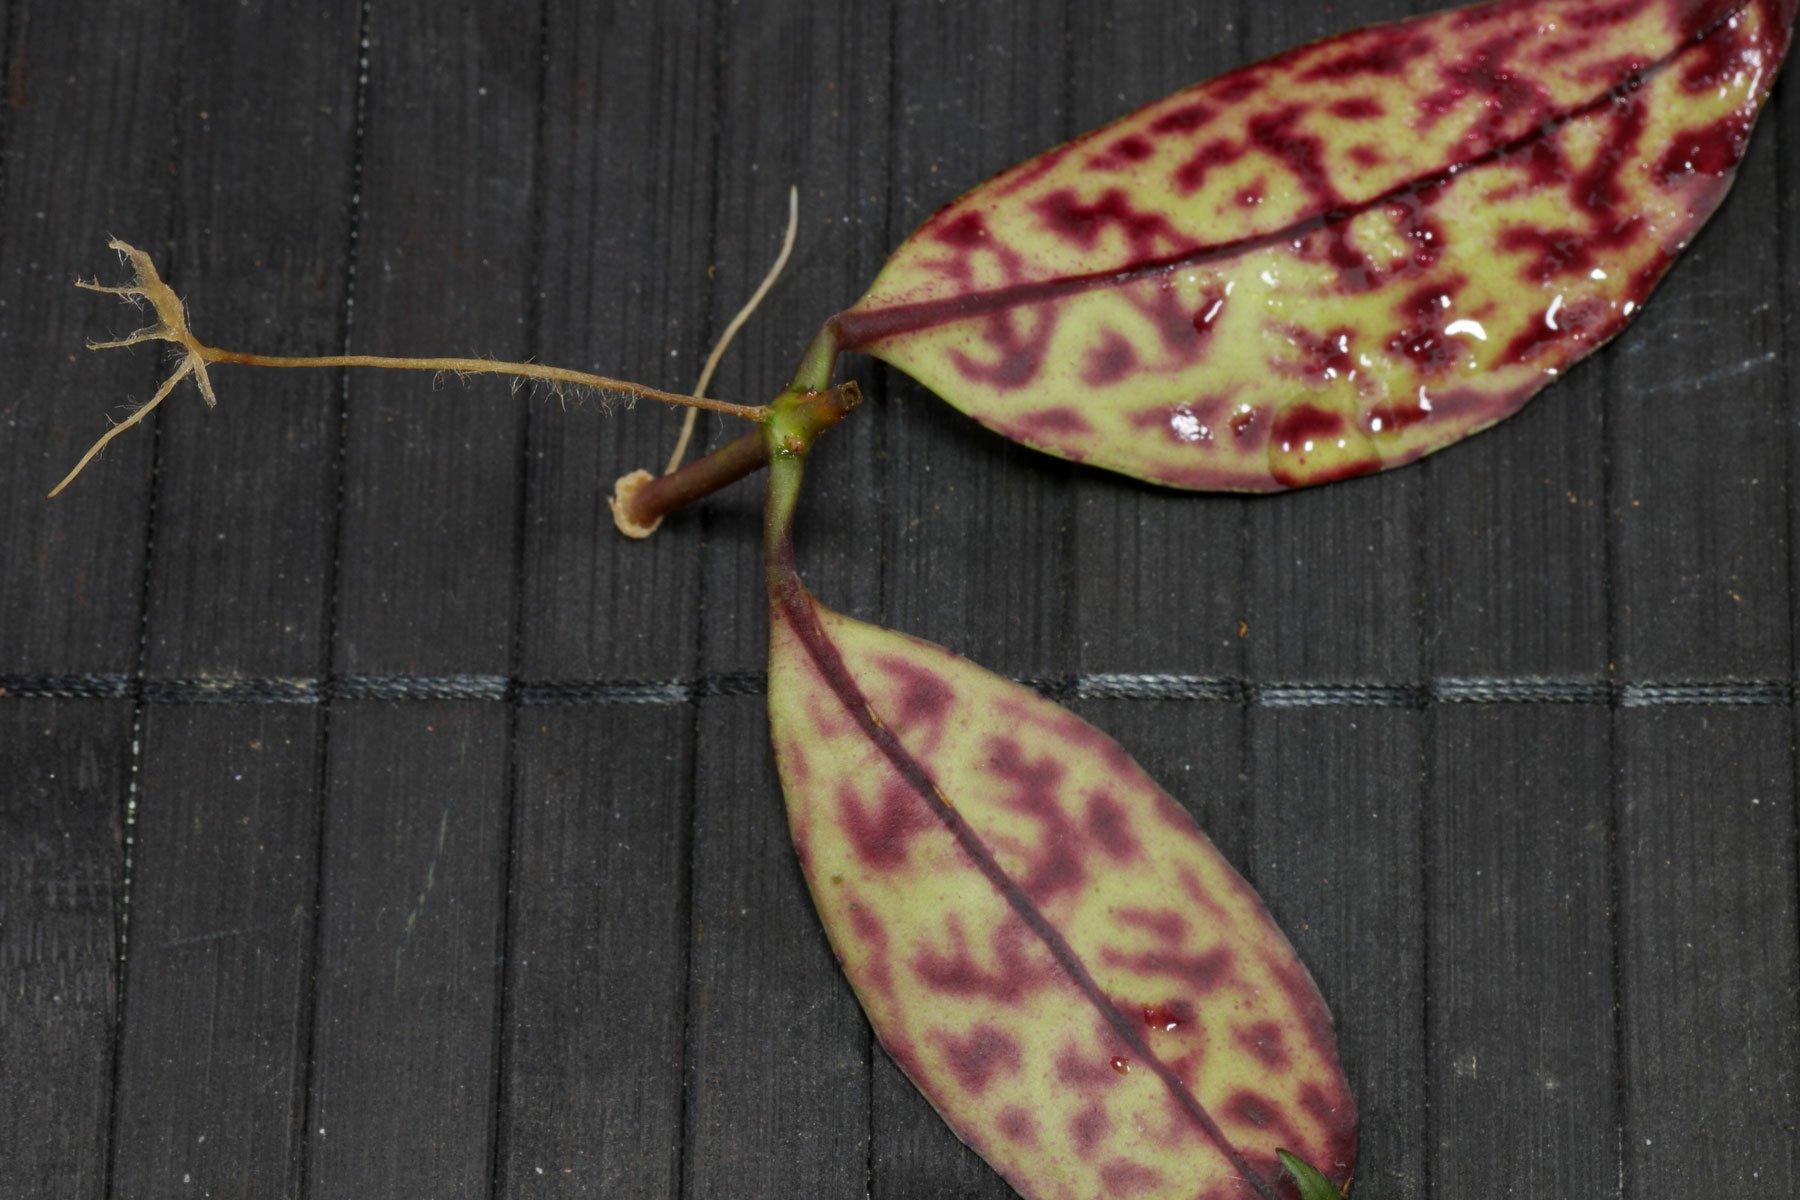 Aeschynanthus longicaulis Steckling